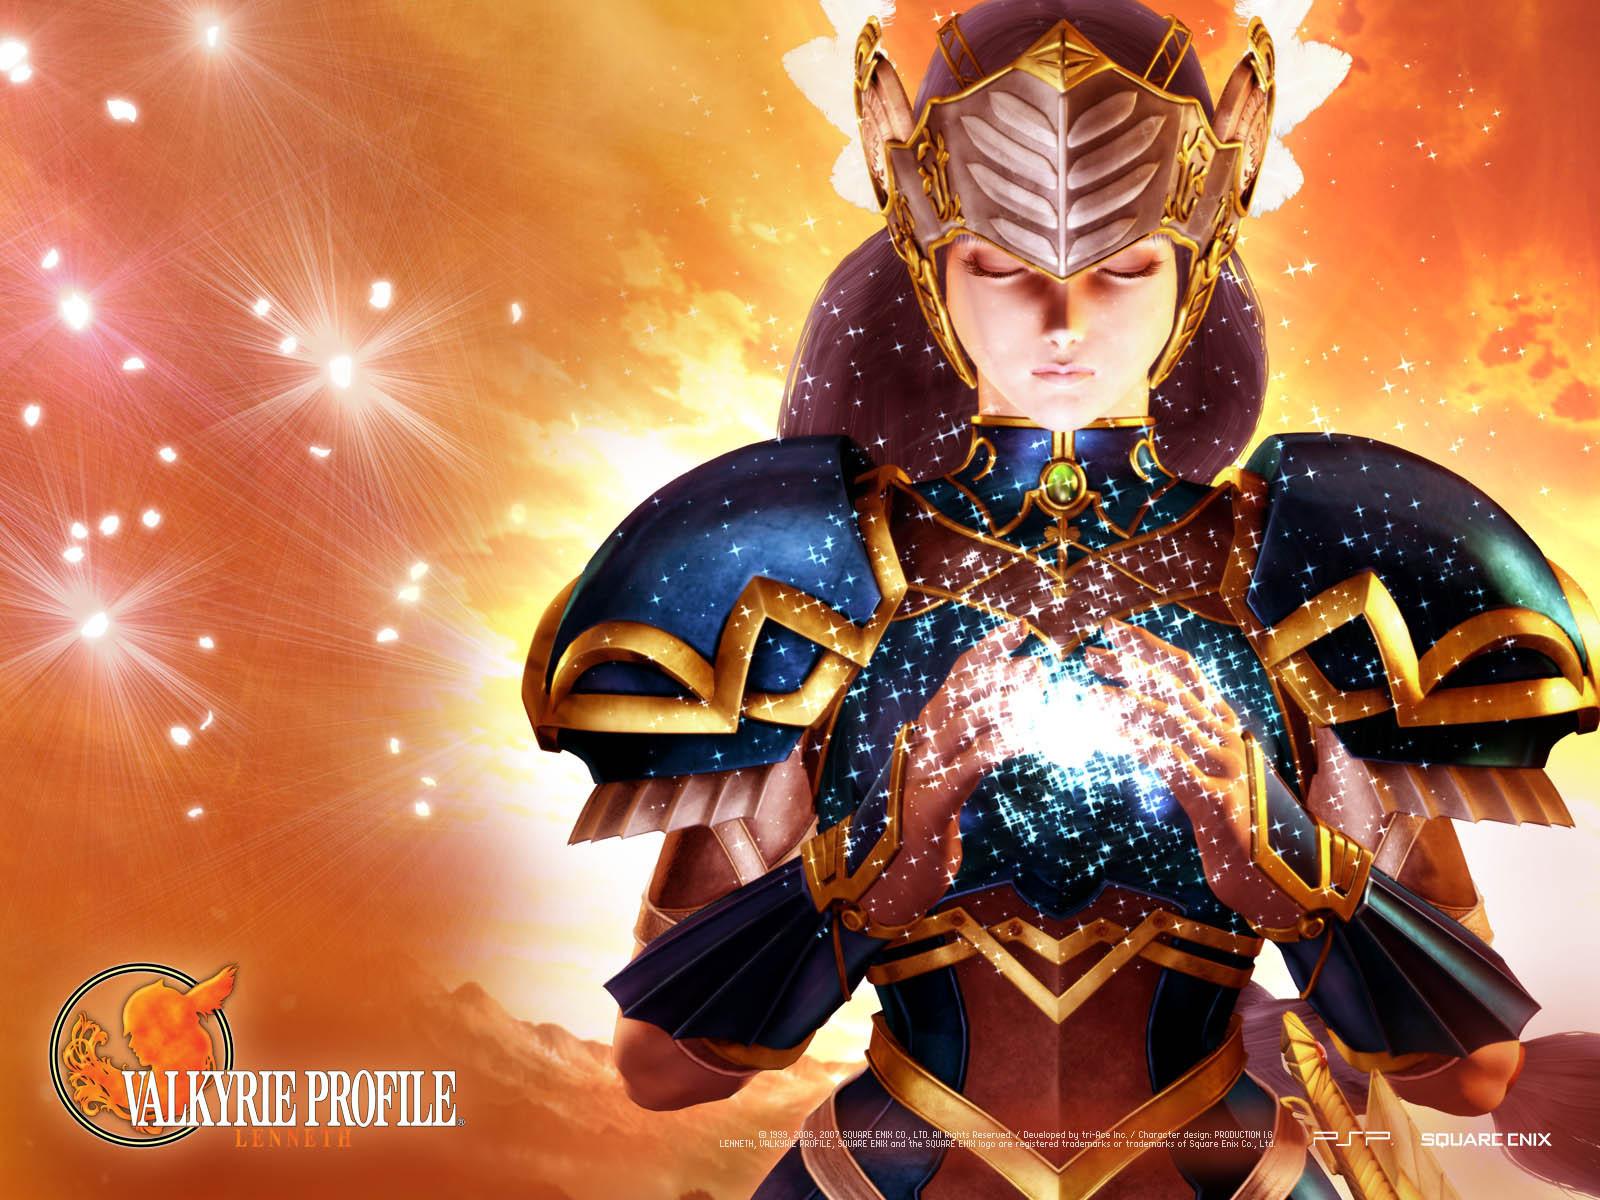 Fantastic Wallpaper Marvel Valkyrie - latest?cb\u003d20120412025631  Pictures_45430.jpg/revision/latest?cb\u003d20120412025631